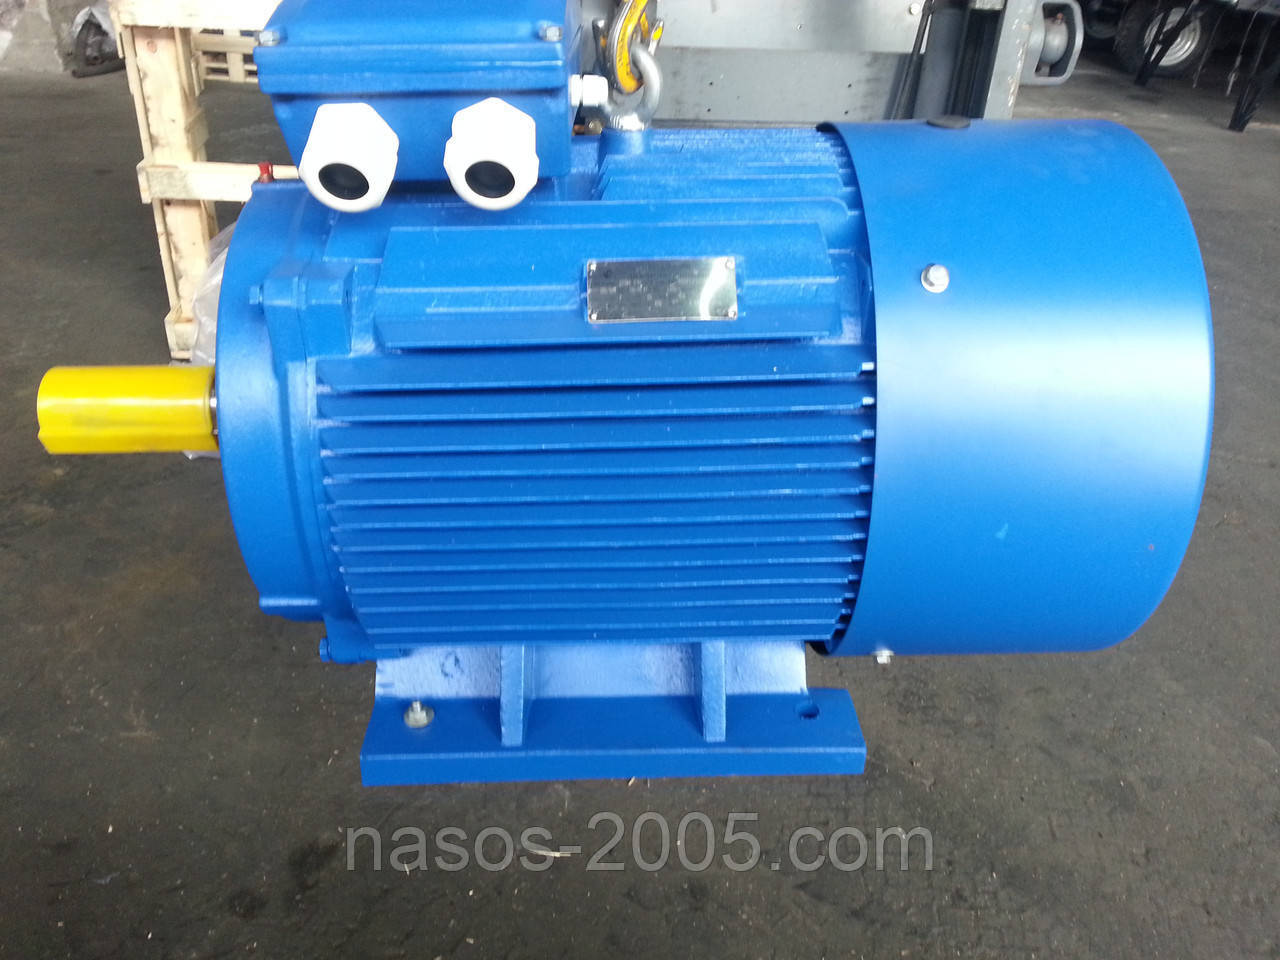 Електродвигун АИР 80 A4 1,1 кВт 1500 об/хв